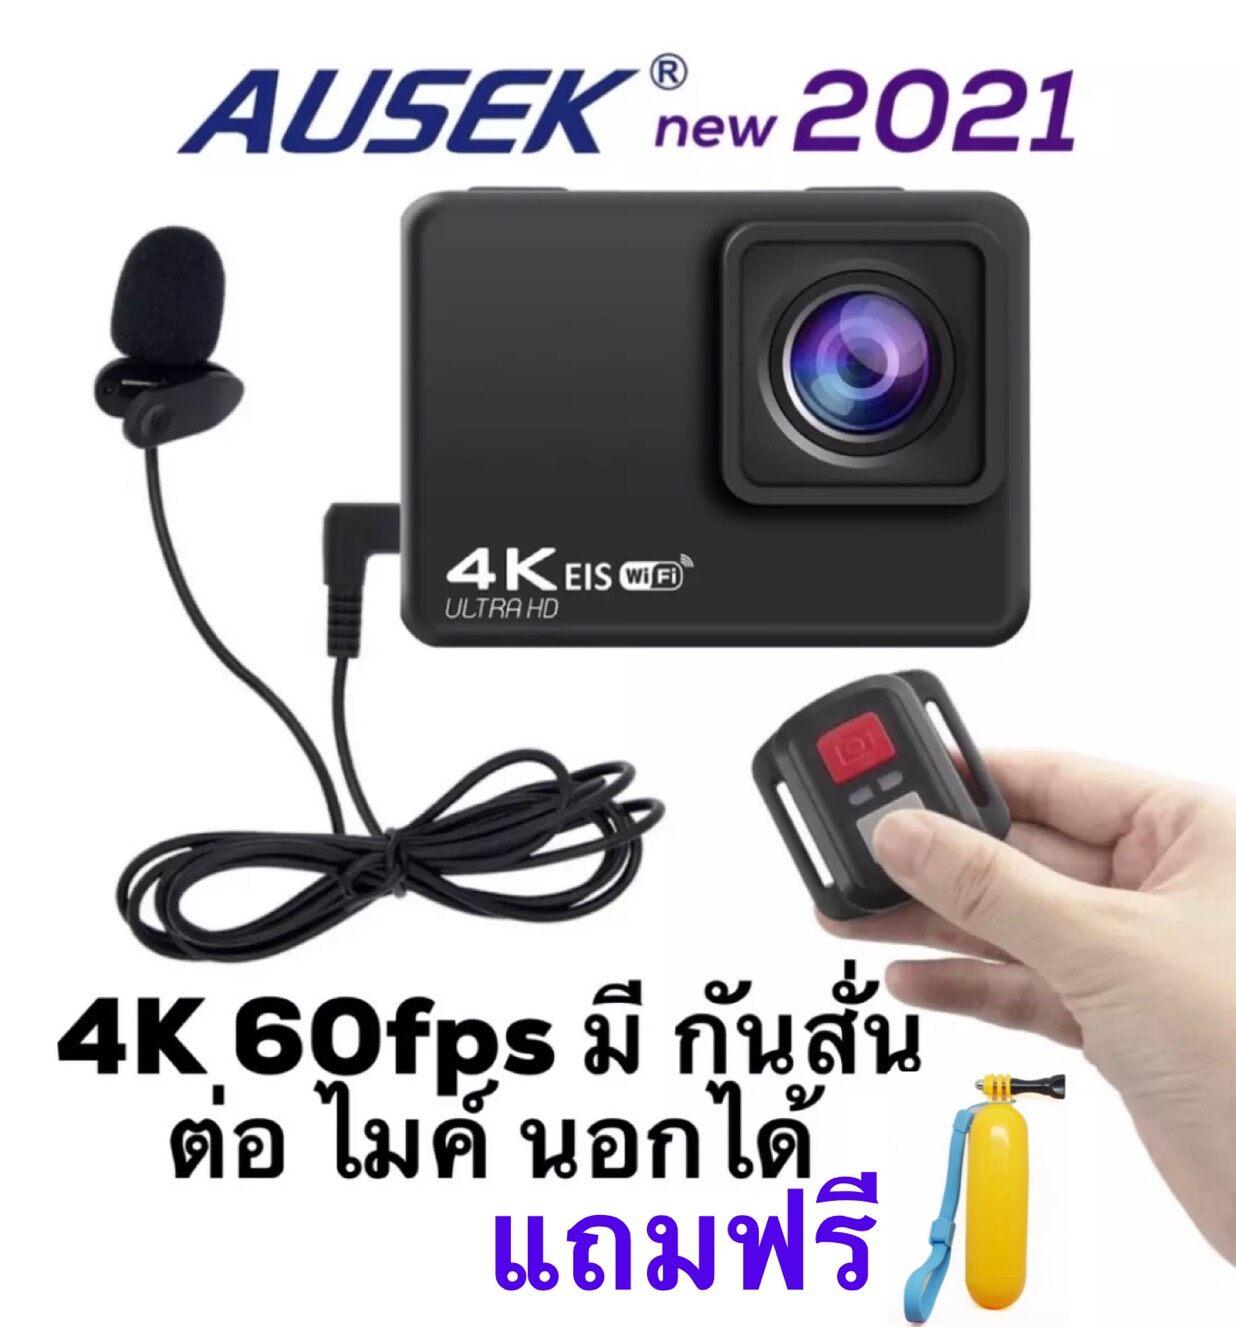 AUSEK รุ่นAT-Q37C 4K60fpsEIS allwinnerV316 ACTIONCAMERA มีระบบกันสั่น มีช่องต่อสายไมค์ได้ รุ่นอัพเกรดพิเศษจากทางร้าน มีรีโมท+อุปกรณ์ครบชุด เฟิร์มแวร์ล่าสุด